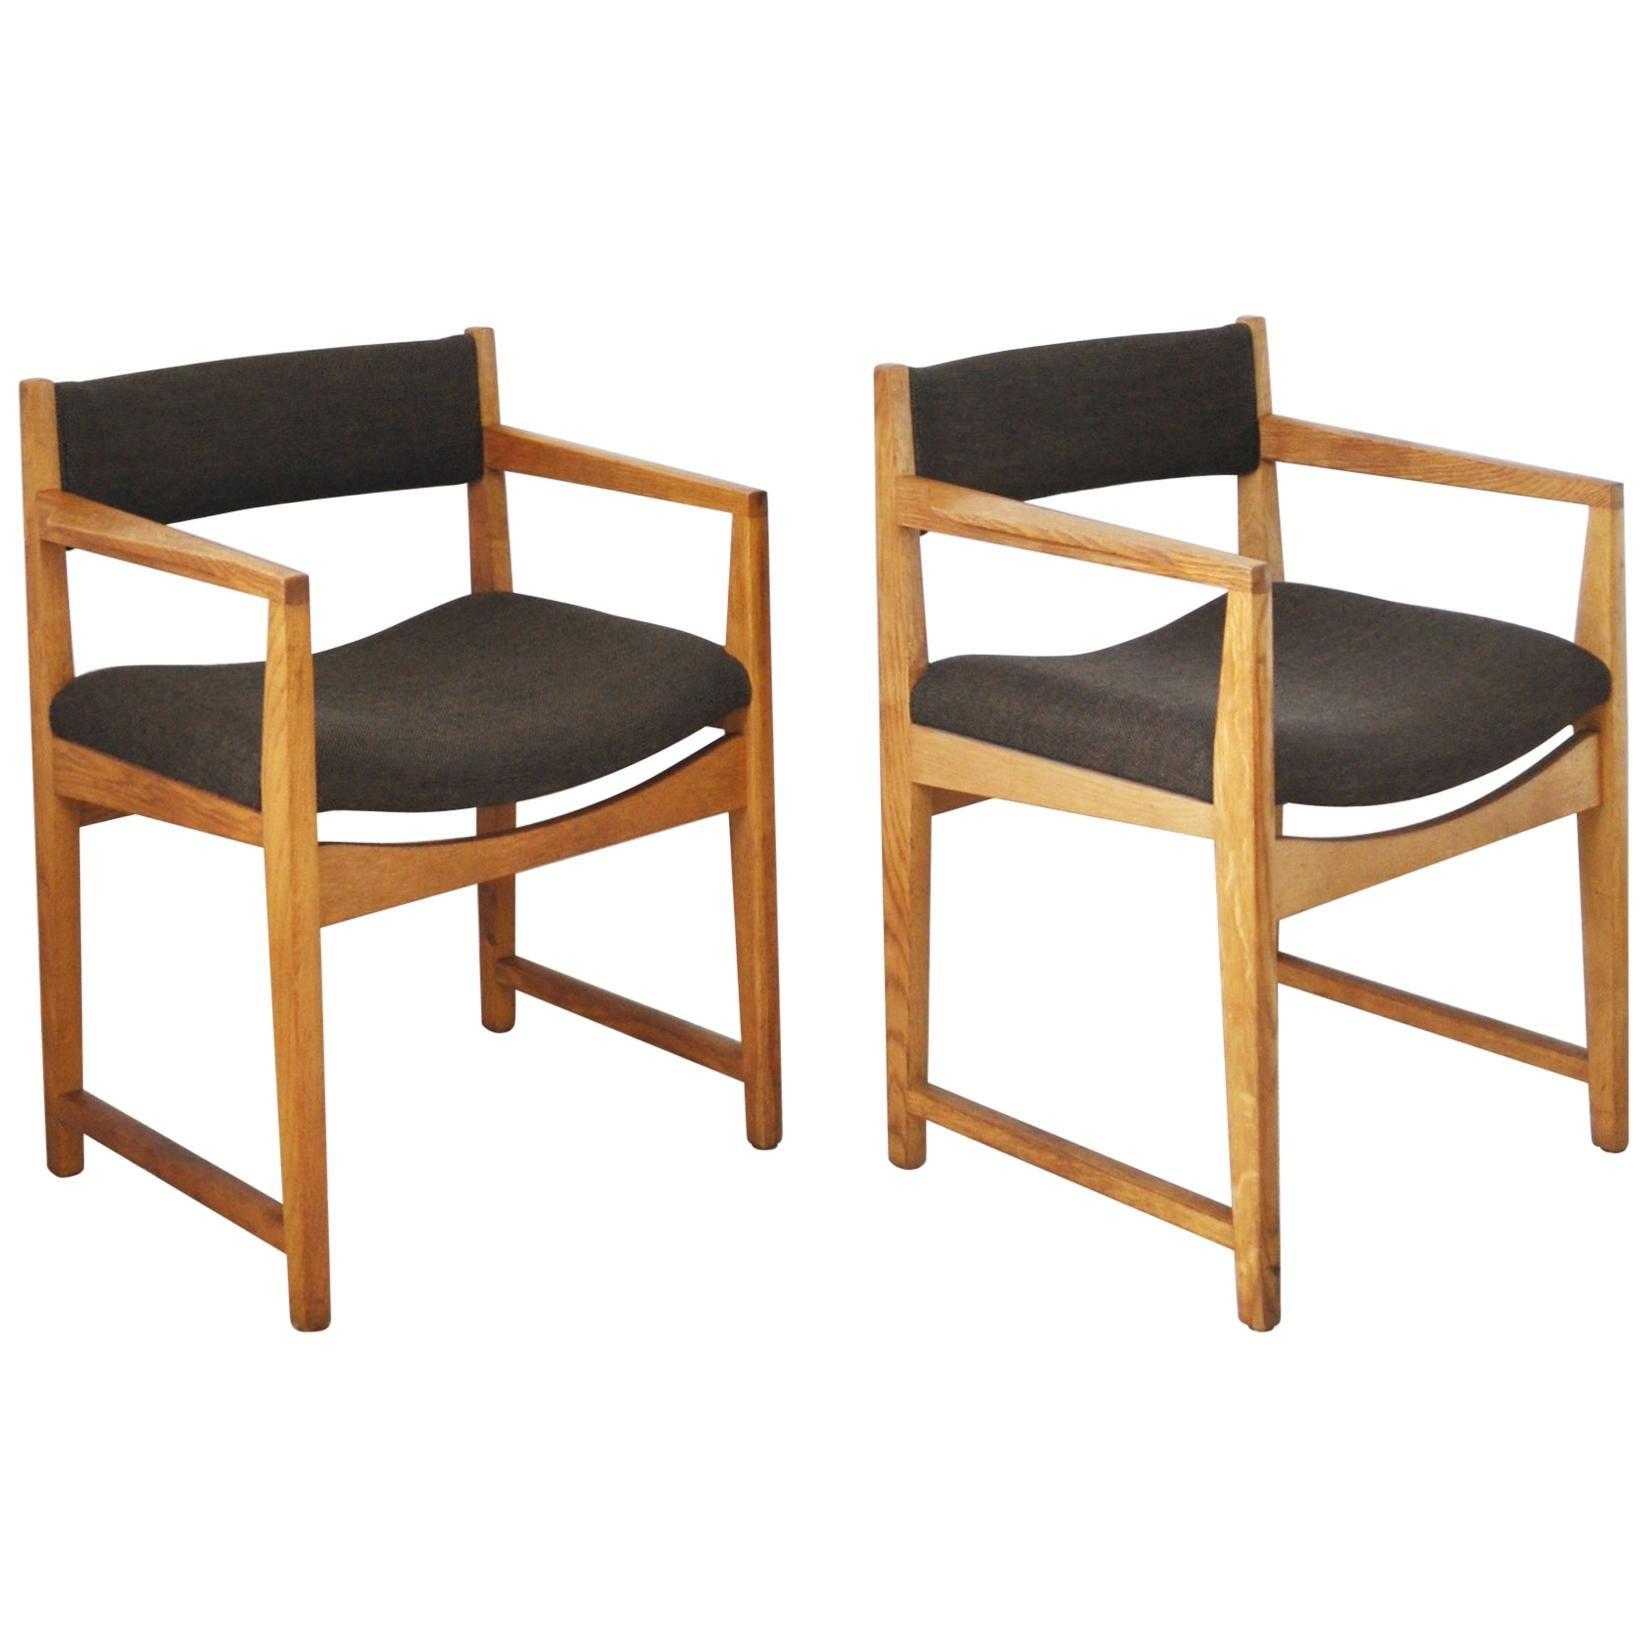 Danish Modern Armchairs by Peter Hvidt & Orla Mølgaard-Nielsen, 1950s-1960s